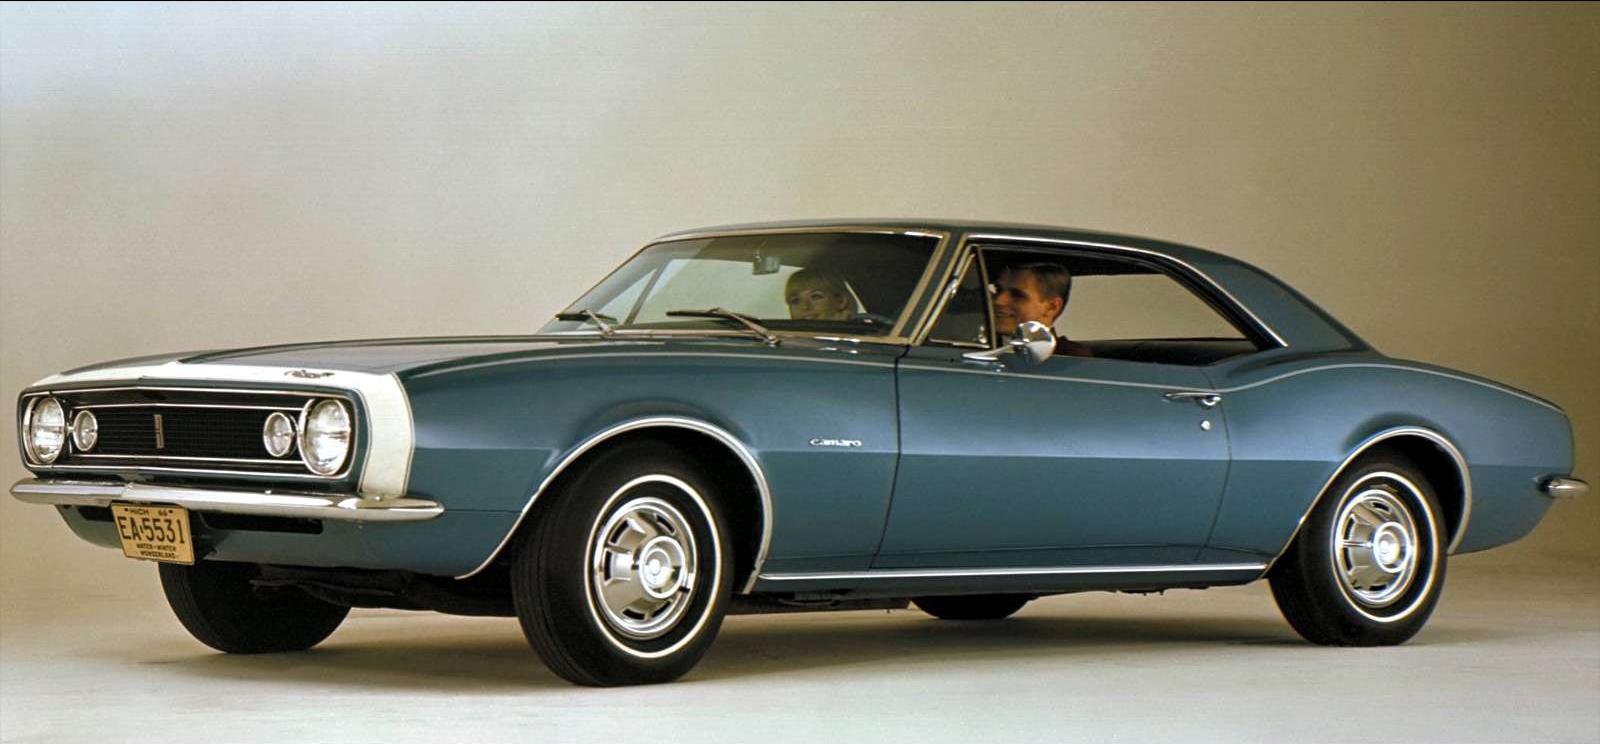 Chevrolet-Camaro-1st-generation-1967